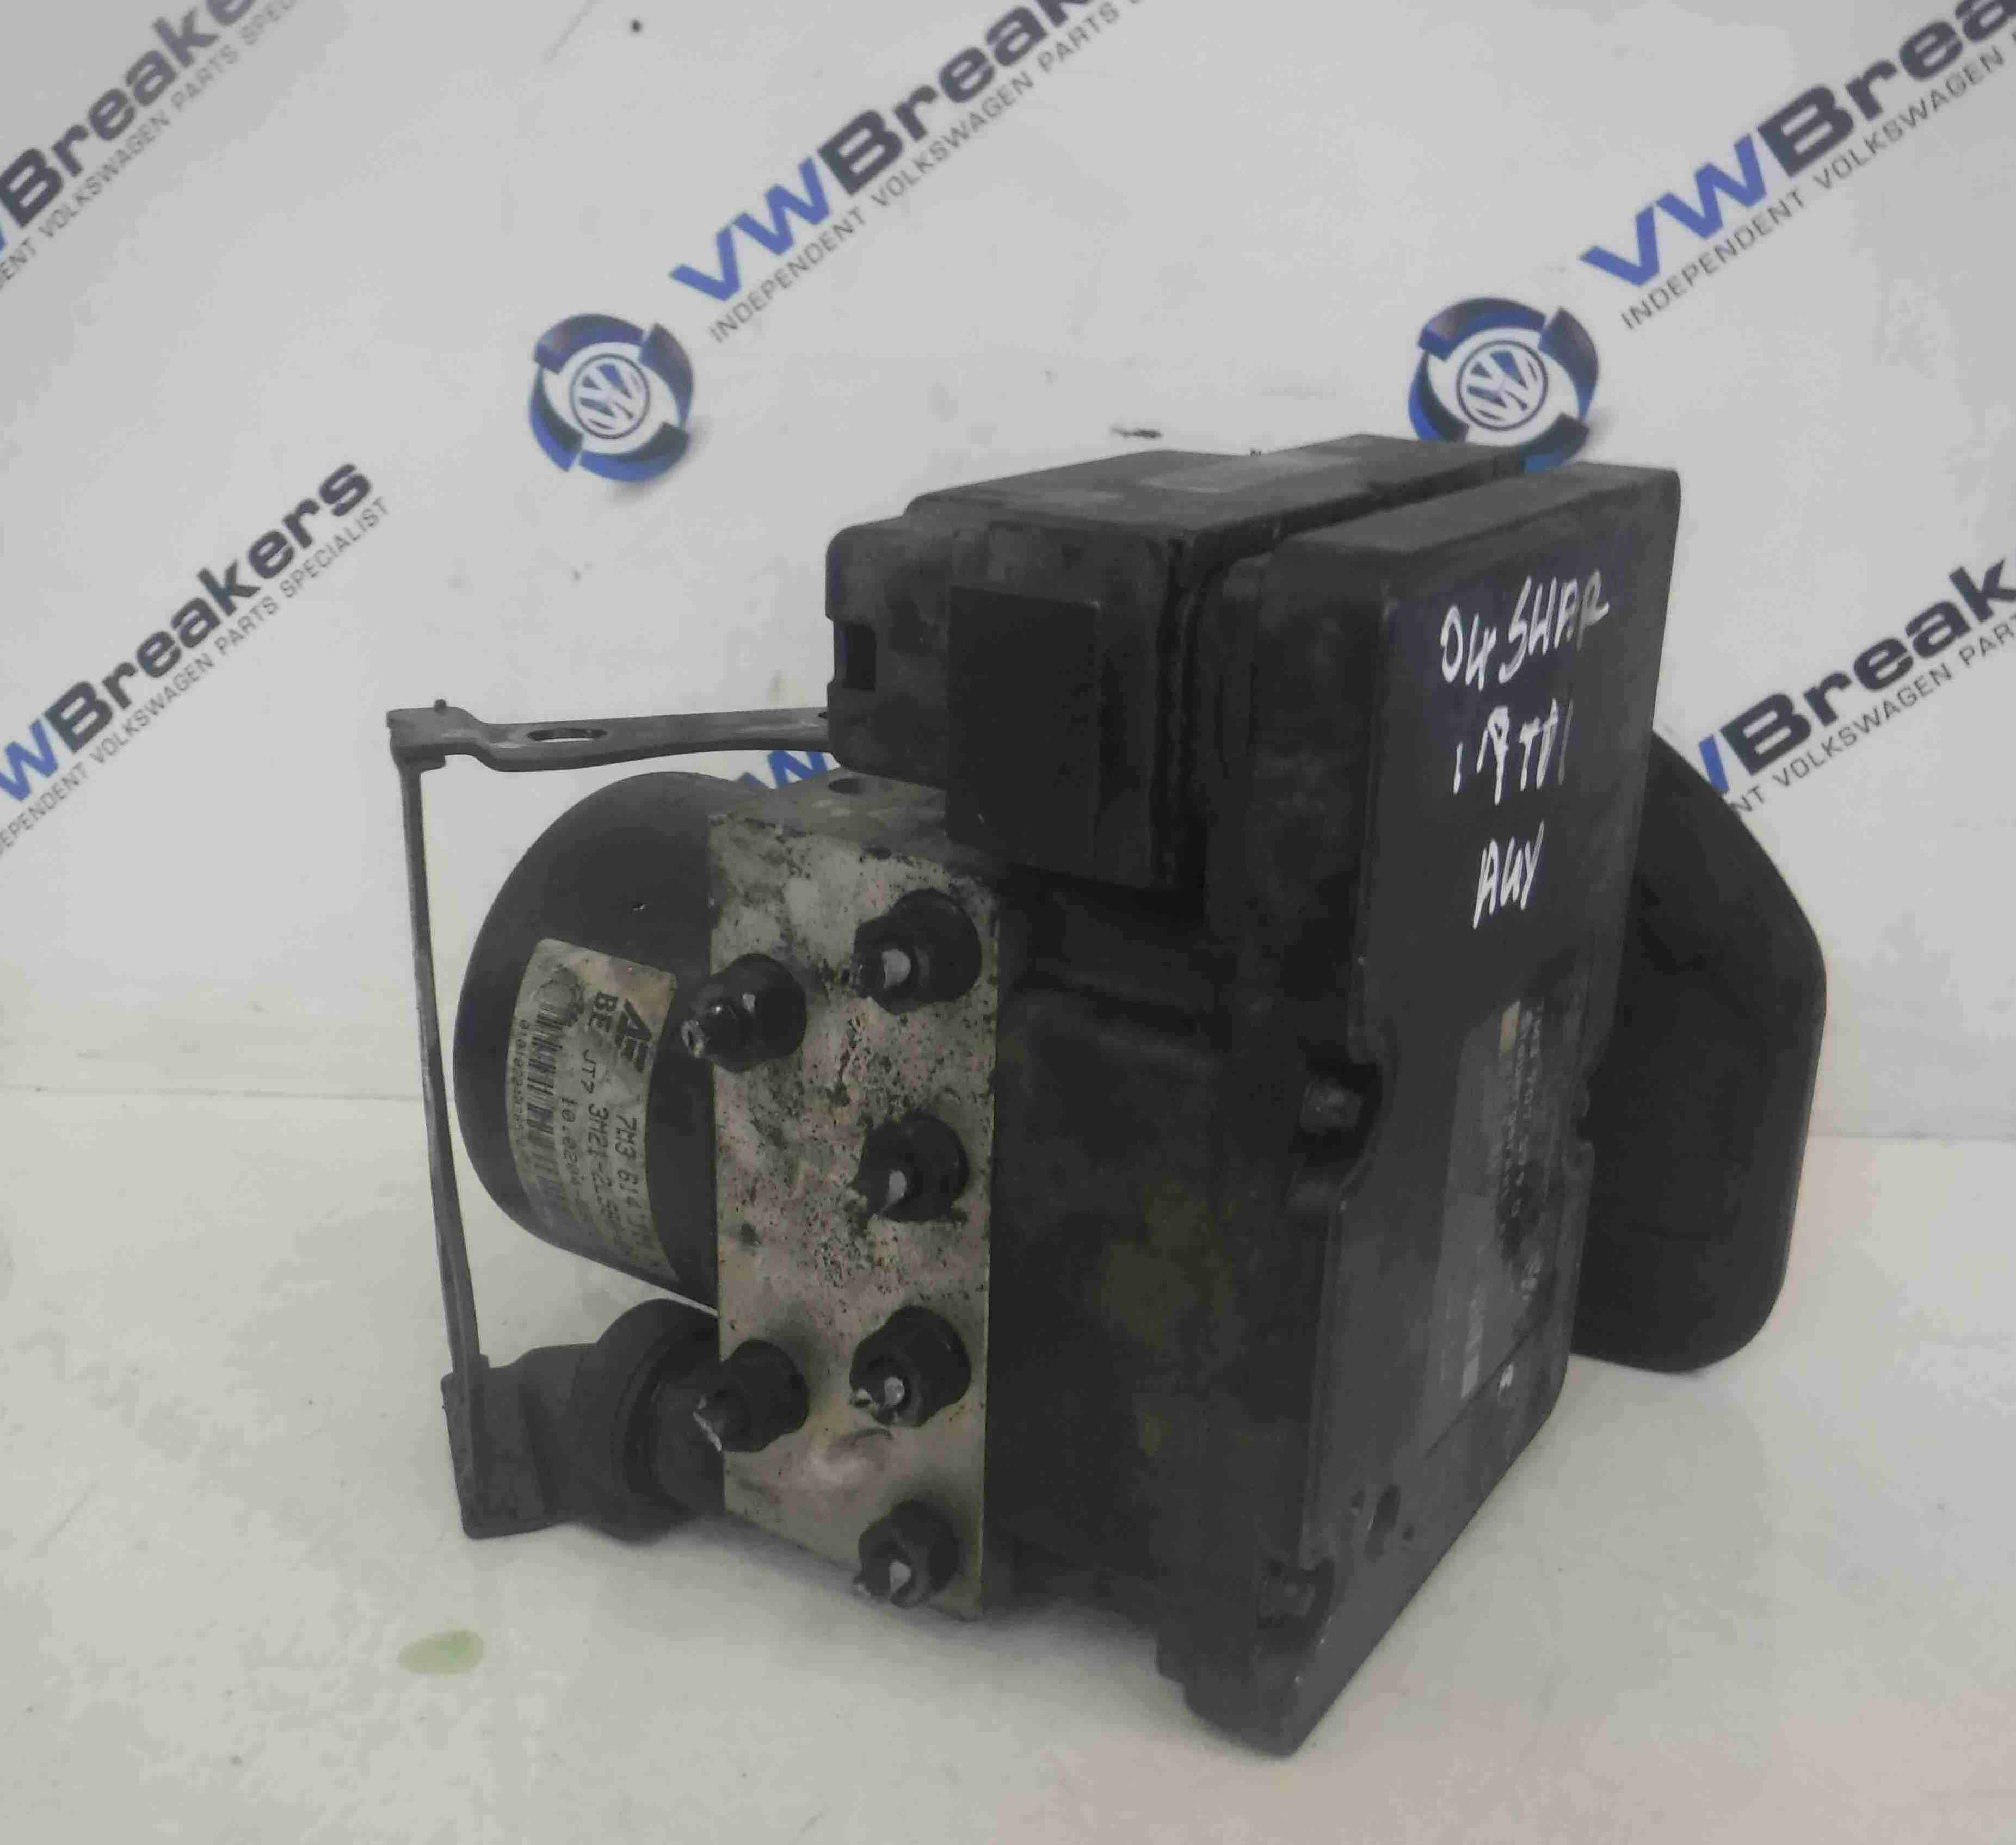 Volkswagen Sharan 2000-2003 ABS Pump Unit 7M3614111H 7M3907379P